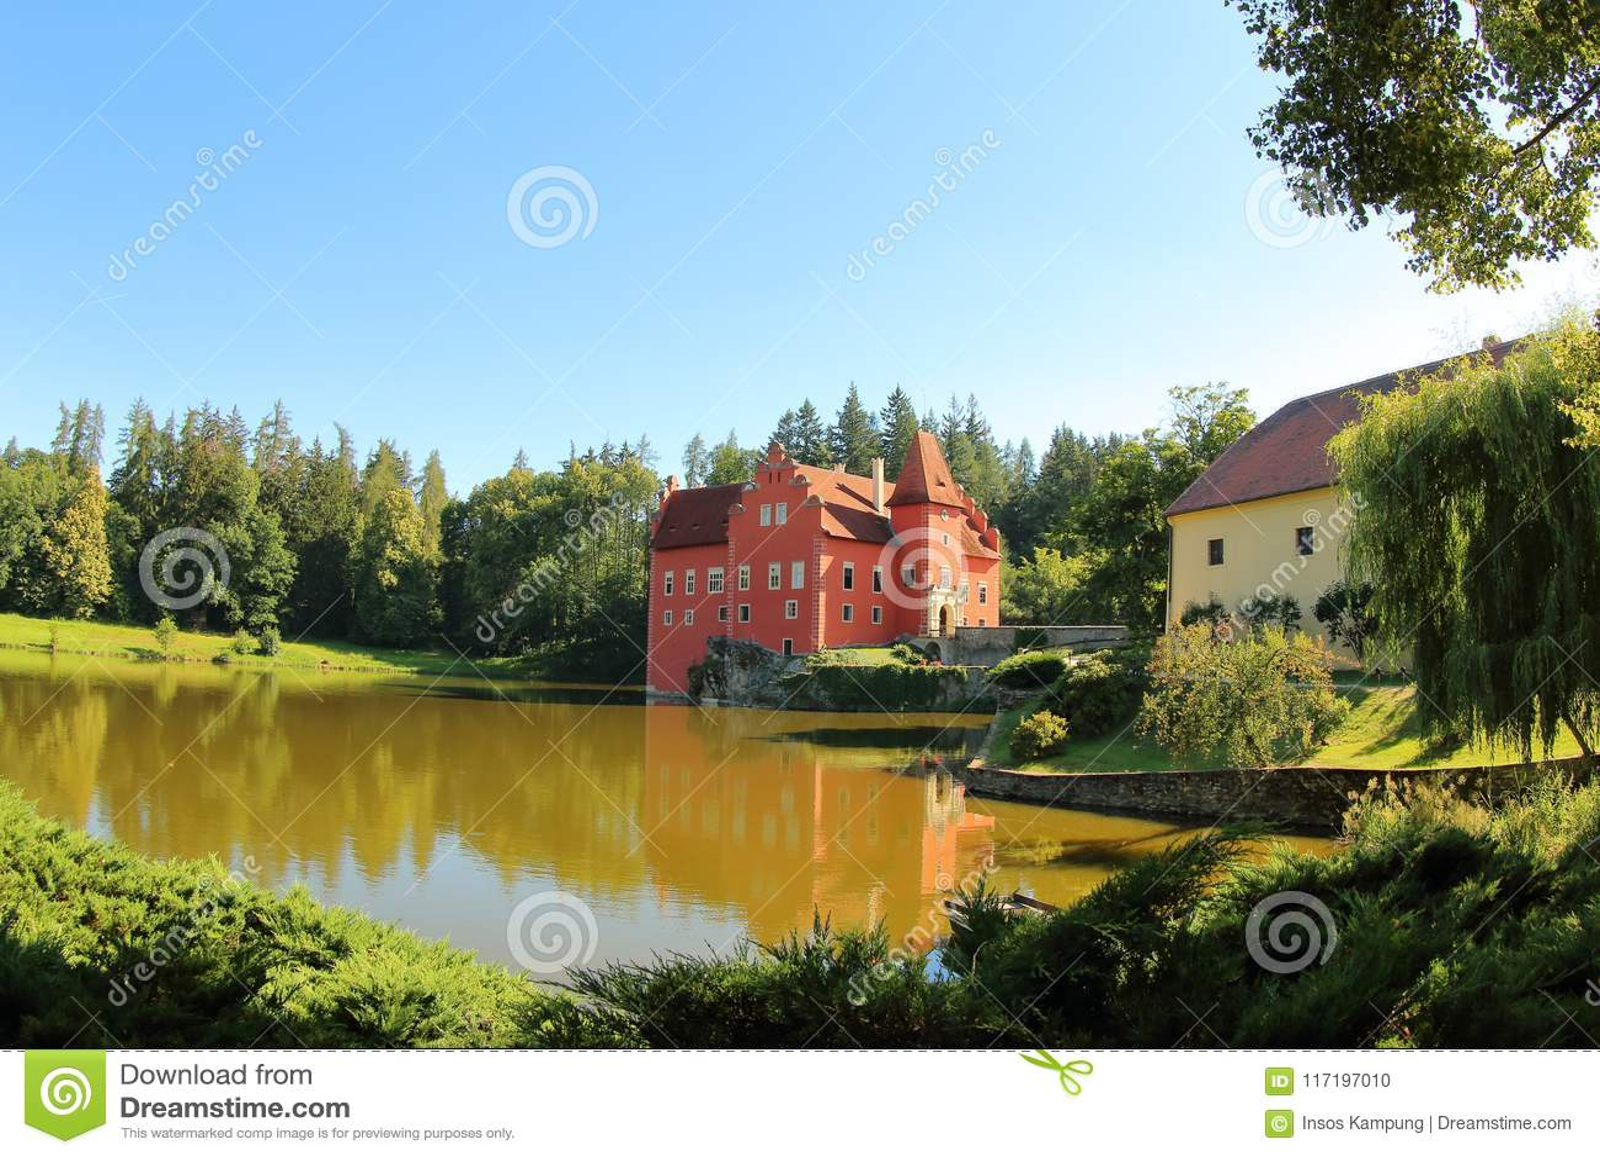 Cervena Lhota, Czech Republic